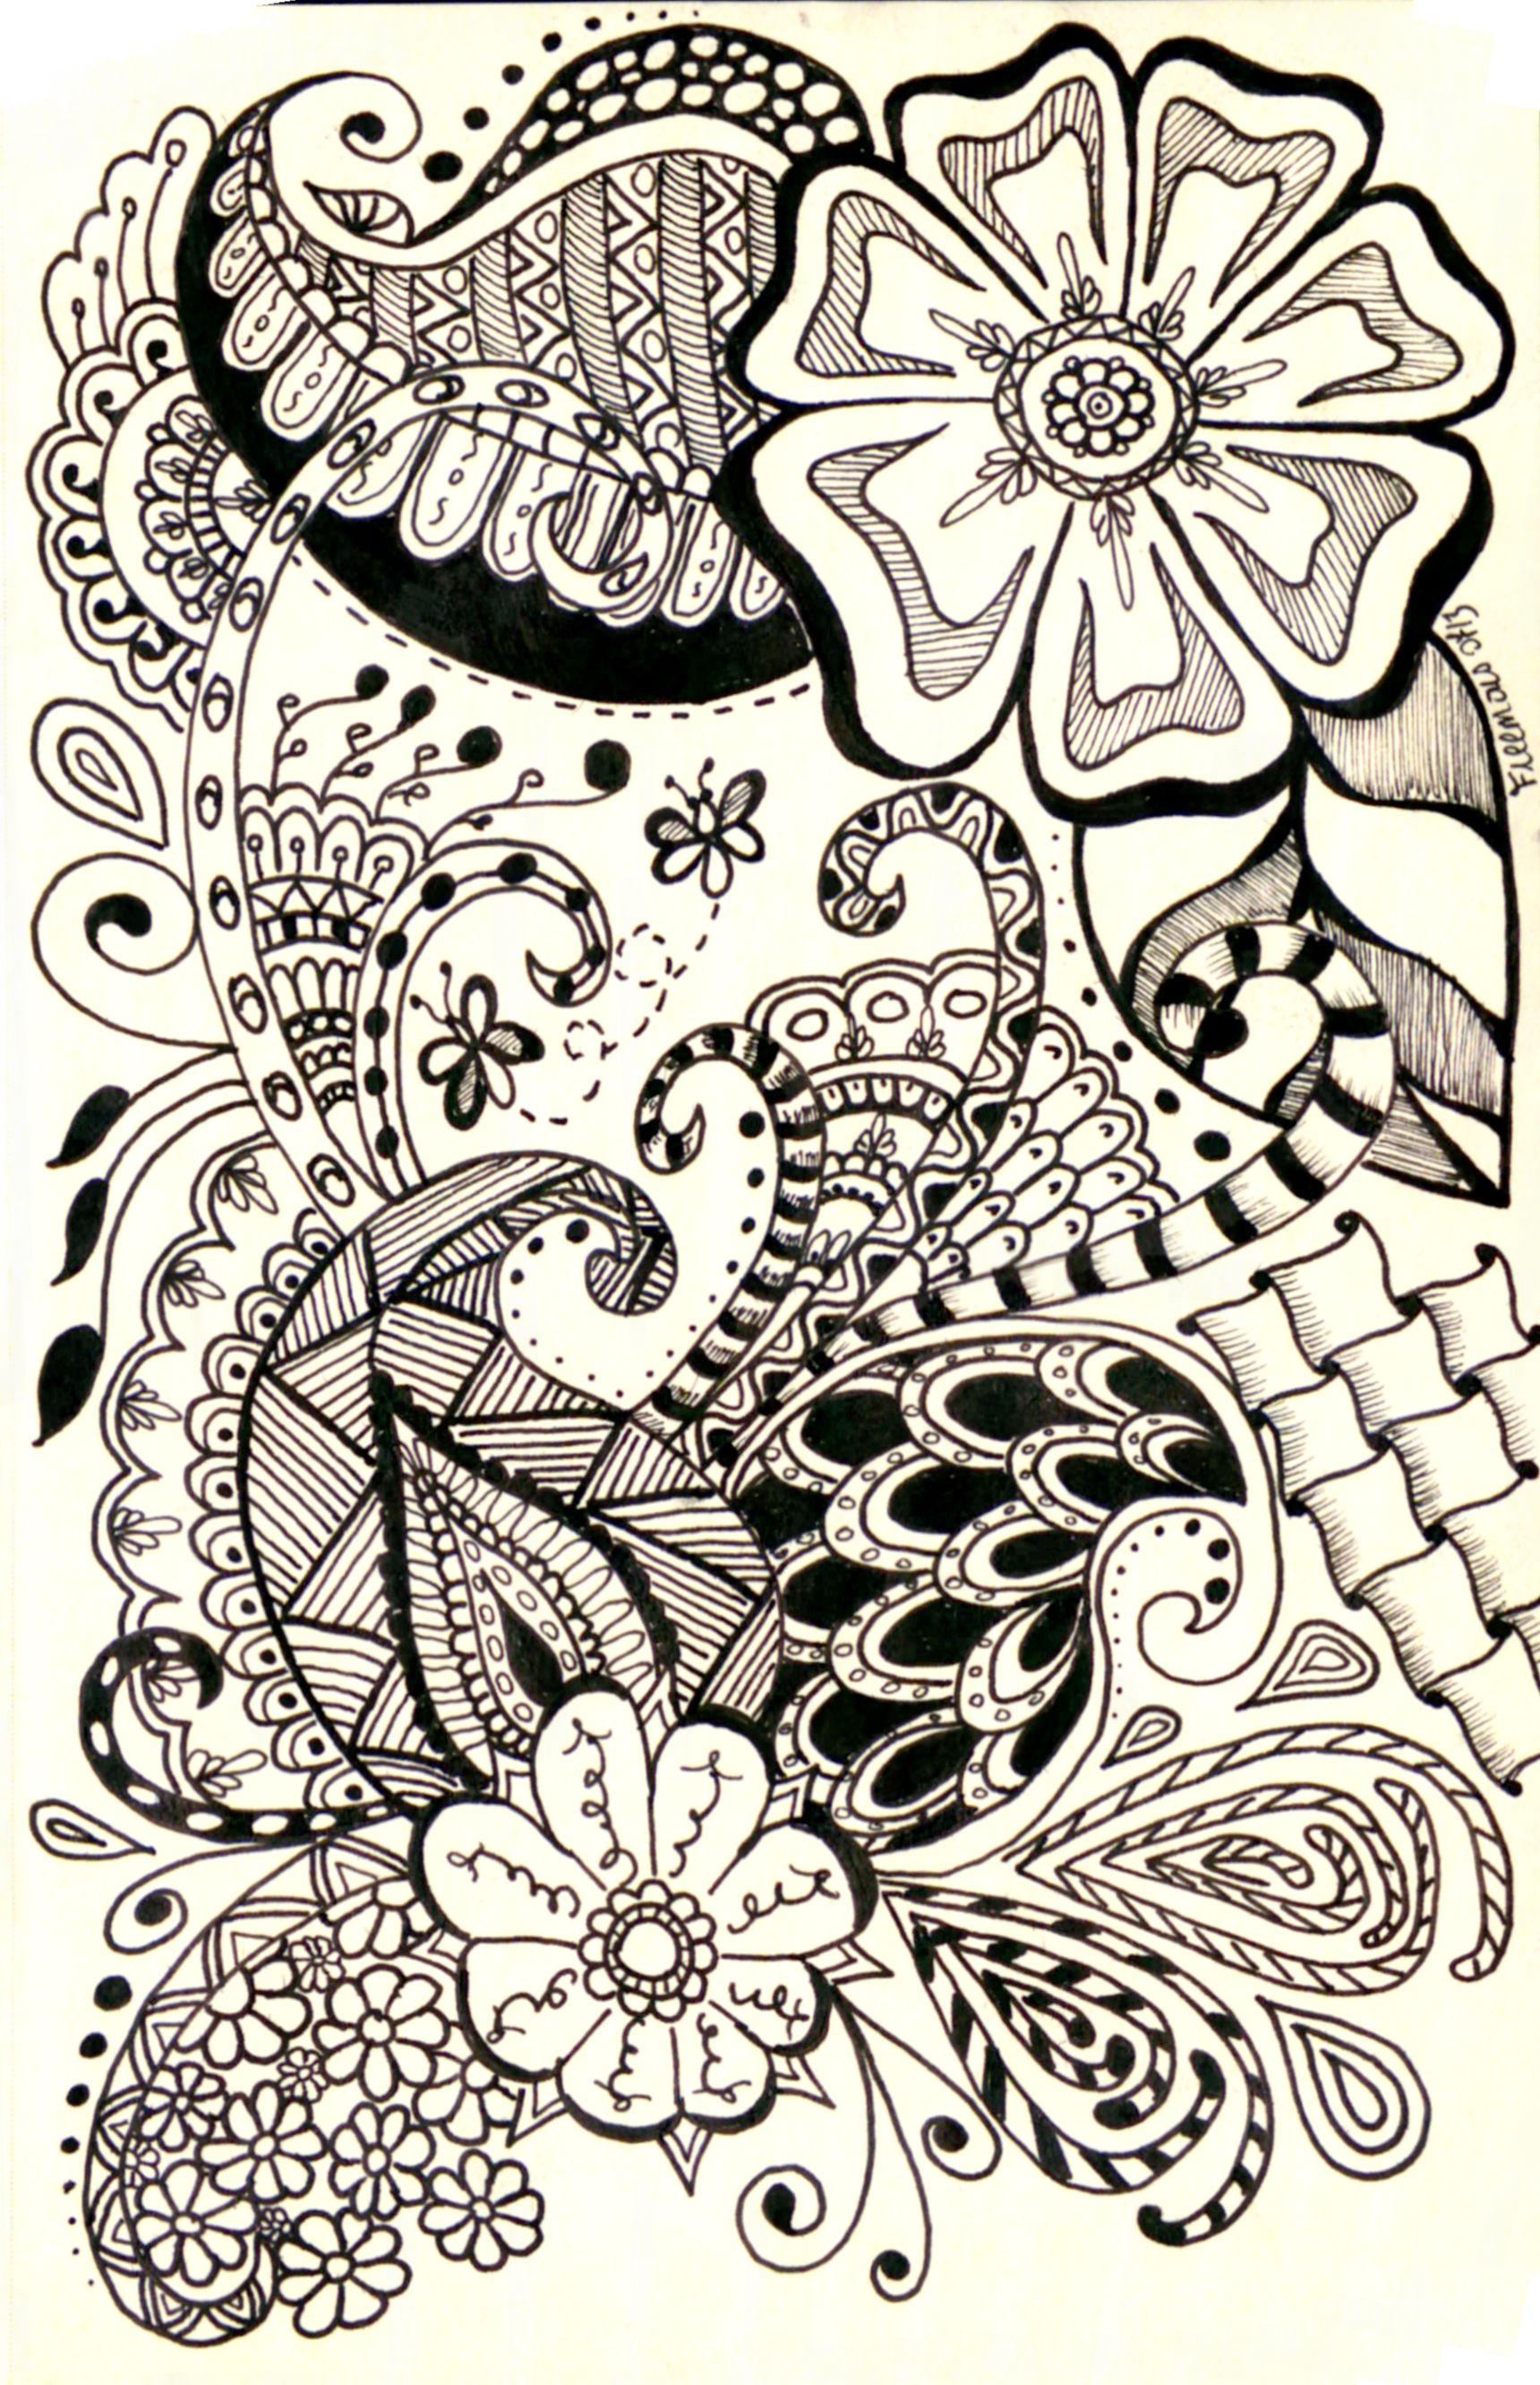 Pin de Dalia Katz en Cuadernos | Pinterest | Mandalas, Dibujo y ...